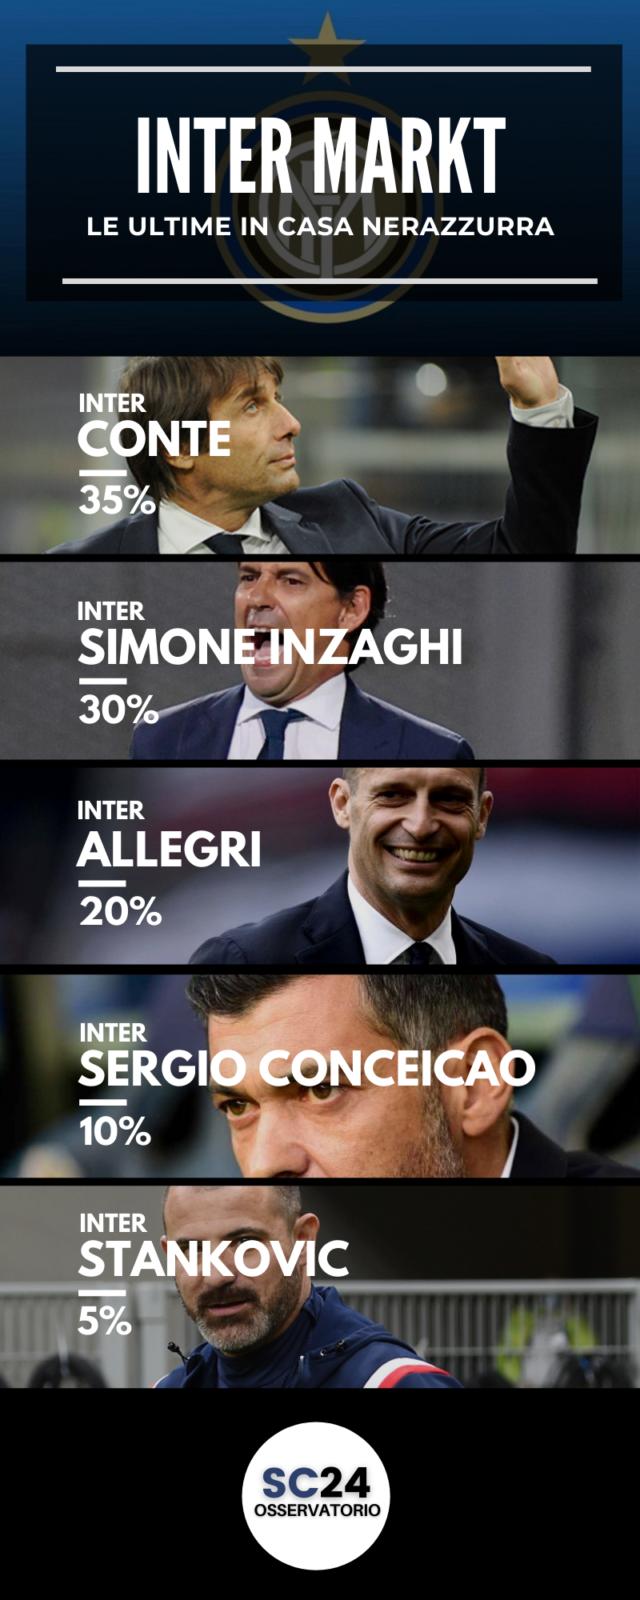 Conteva via o rimane all'Inter?